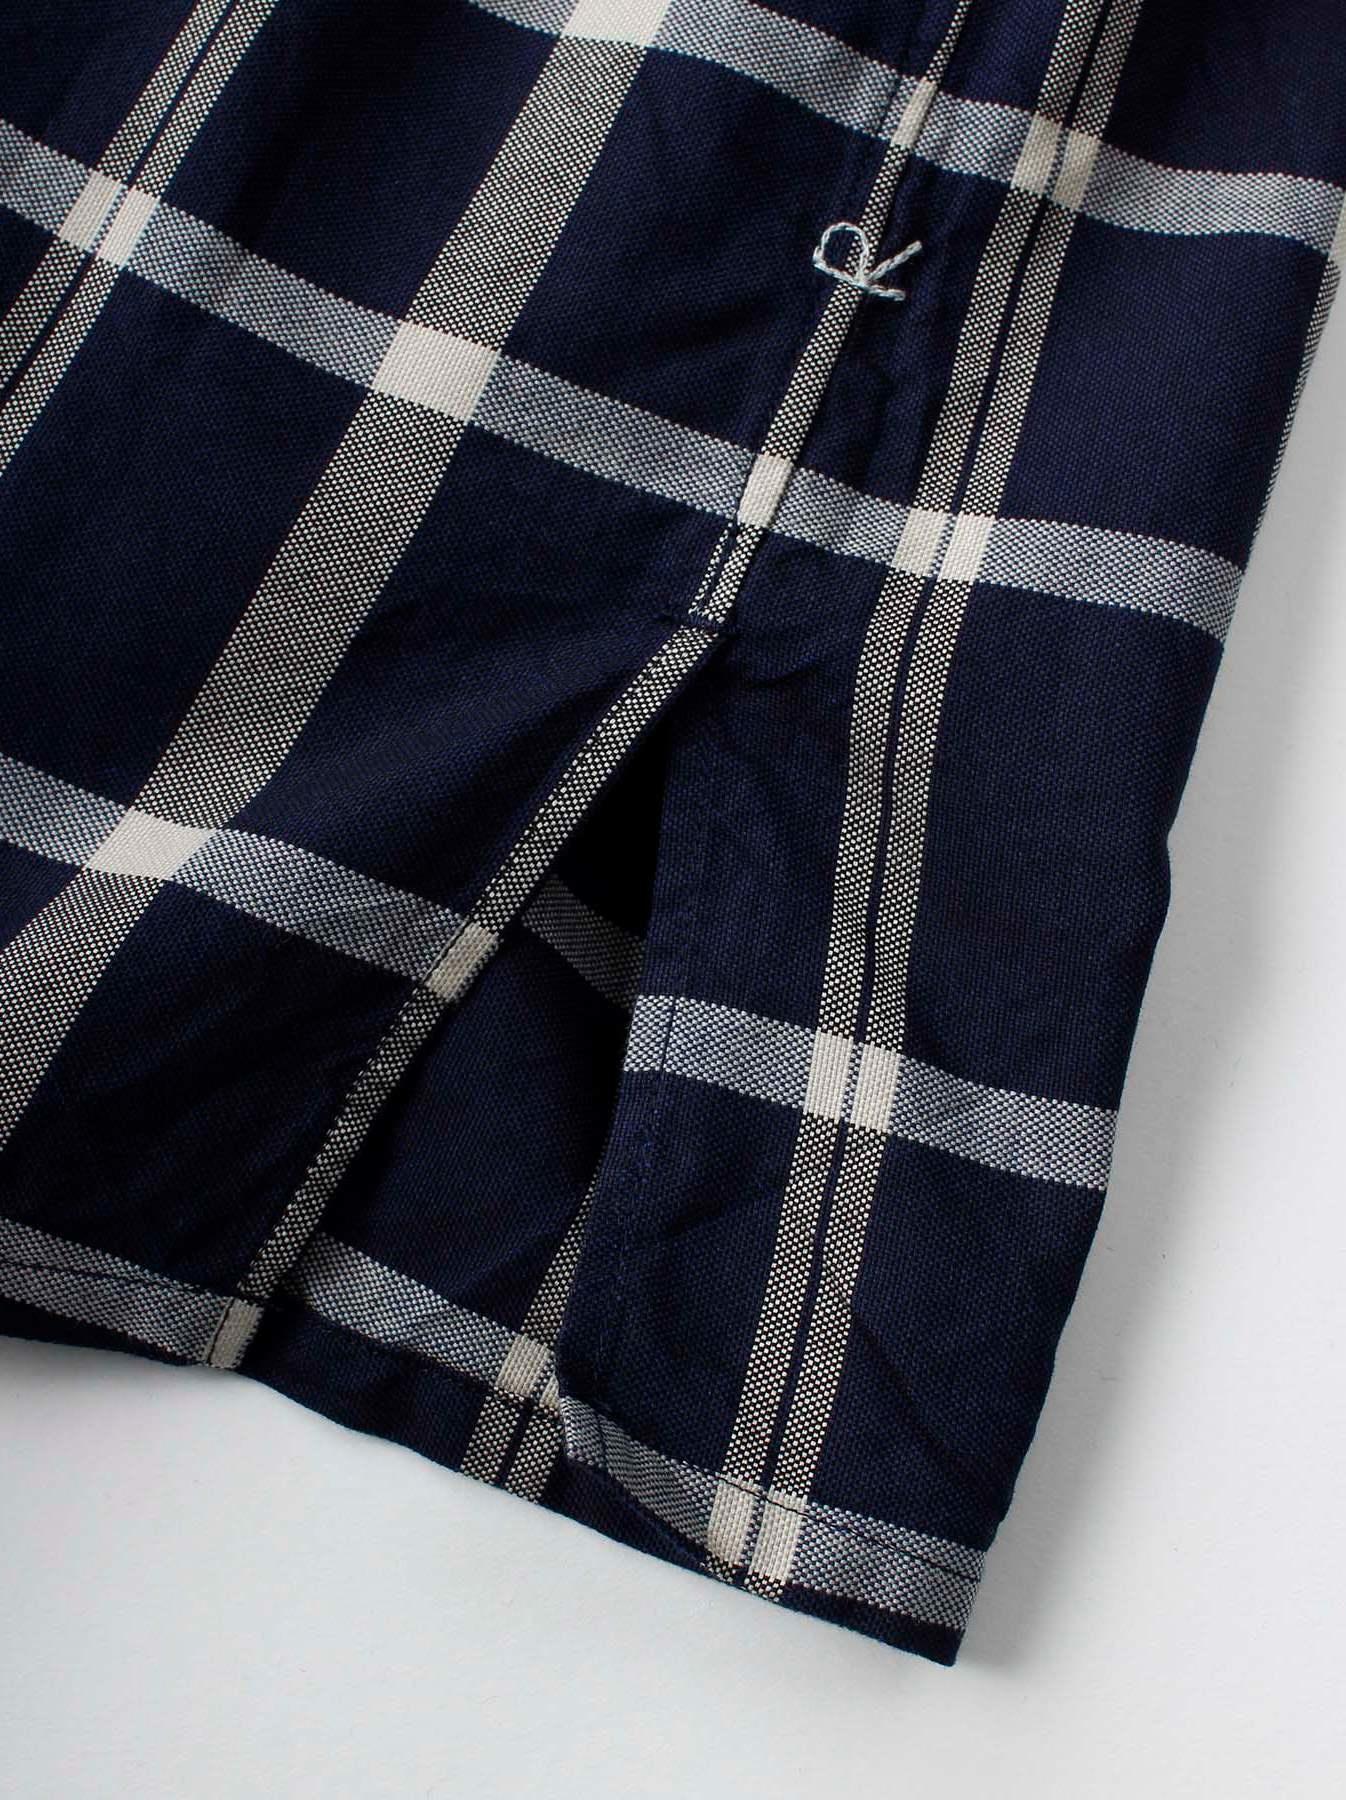 WH Indigo Oxford 908 Round Collar Shirt-10